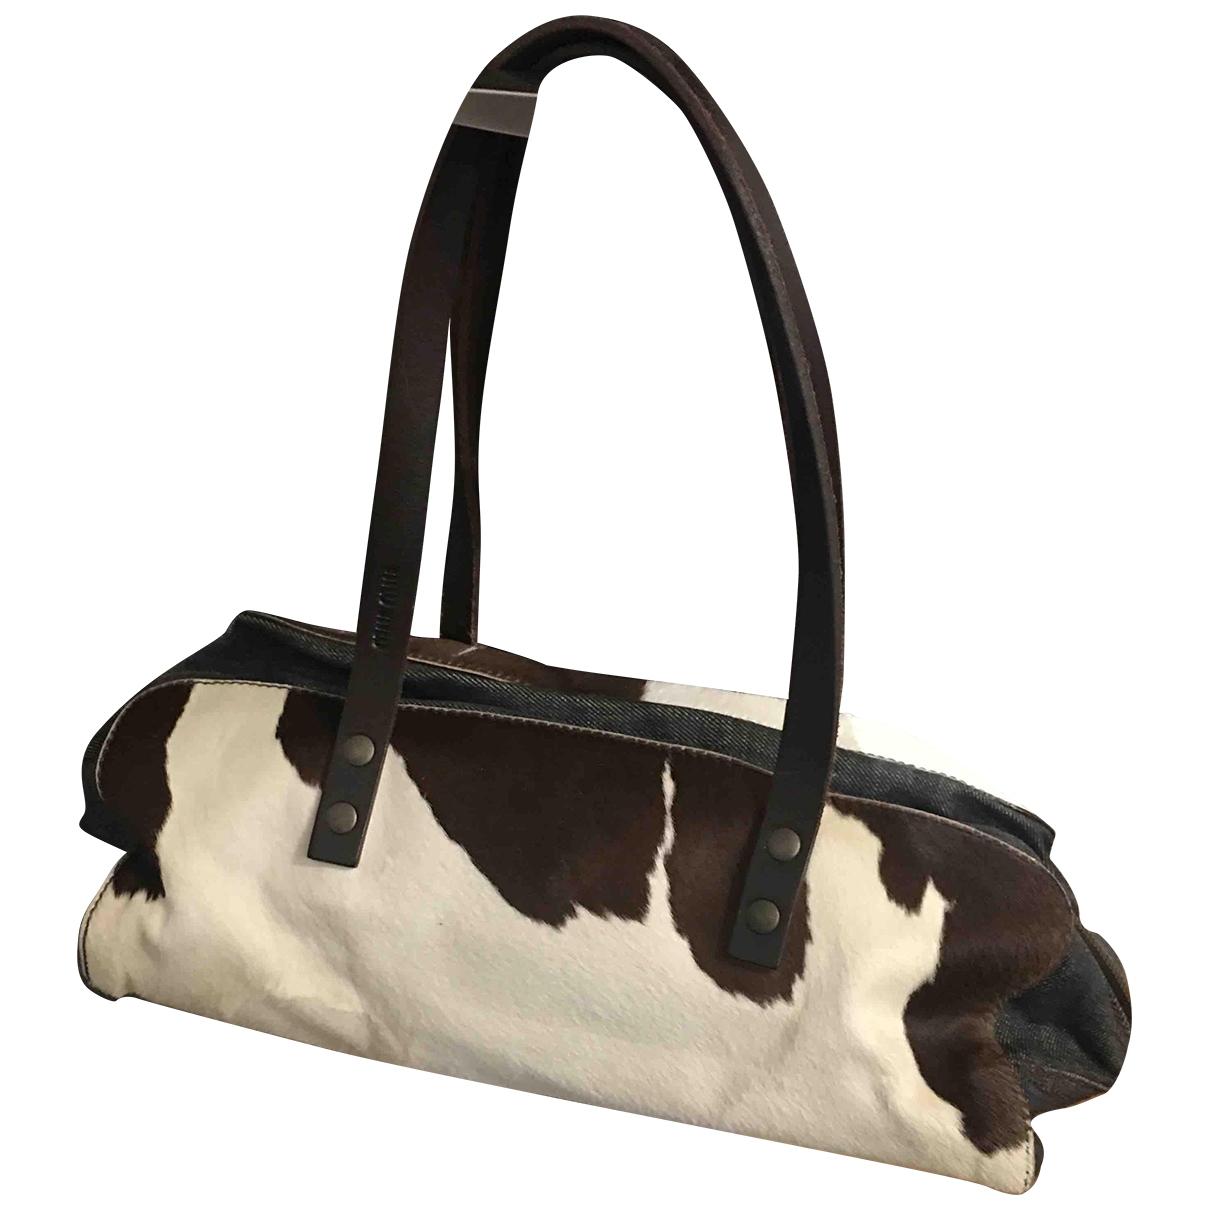 Miu Miu \N Brown Pony-style calfskin handbag for Women \N